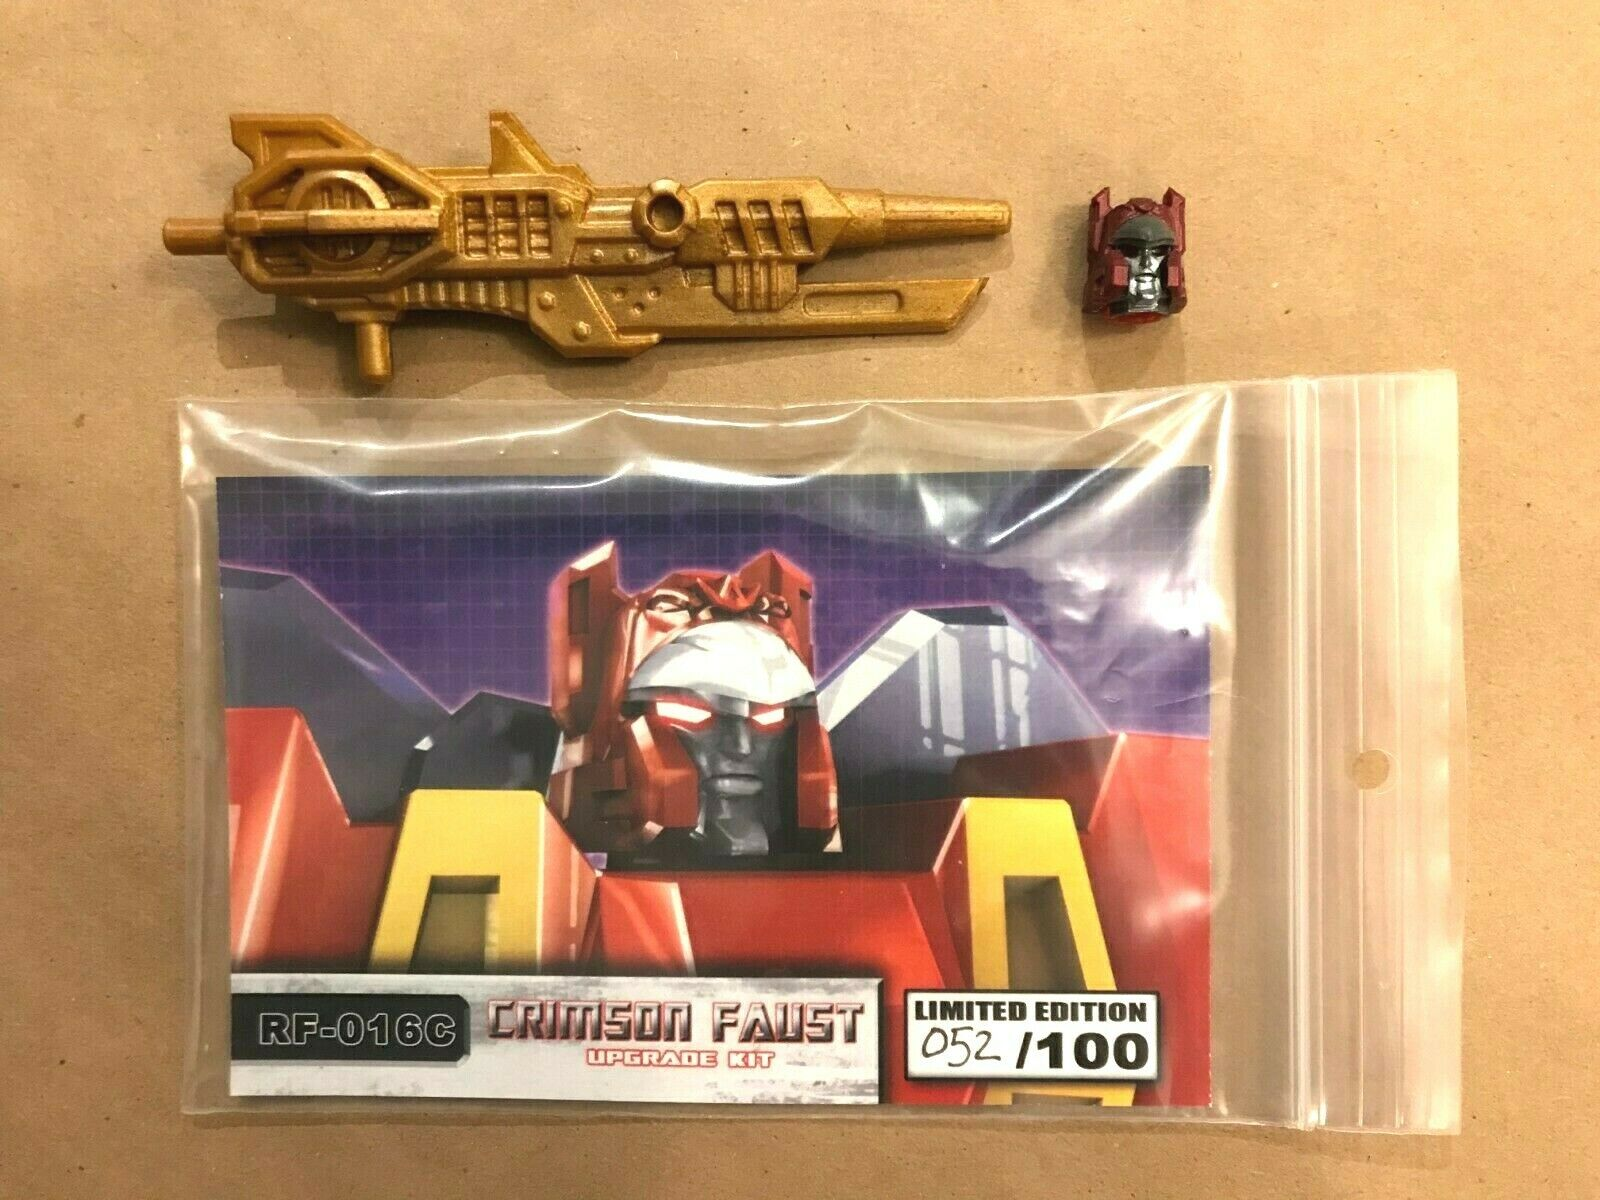 Renderform  RF-016C Crimson Faust Upgrade Kit Transformers Go  budora nouveau  top marque